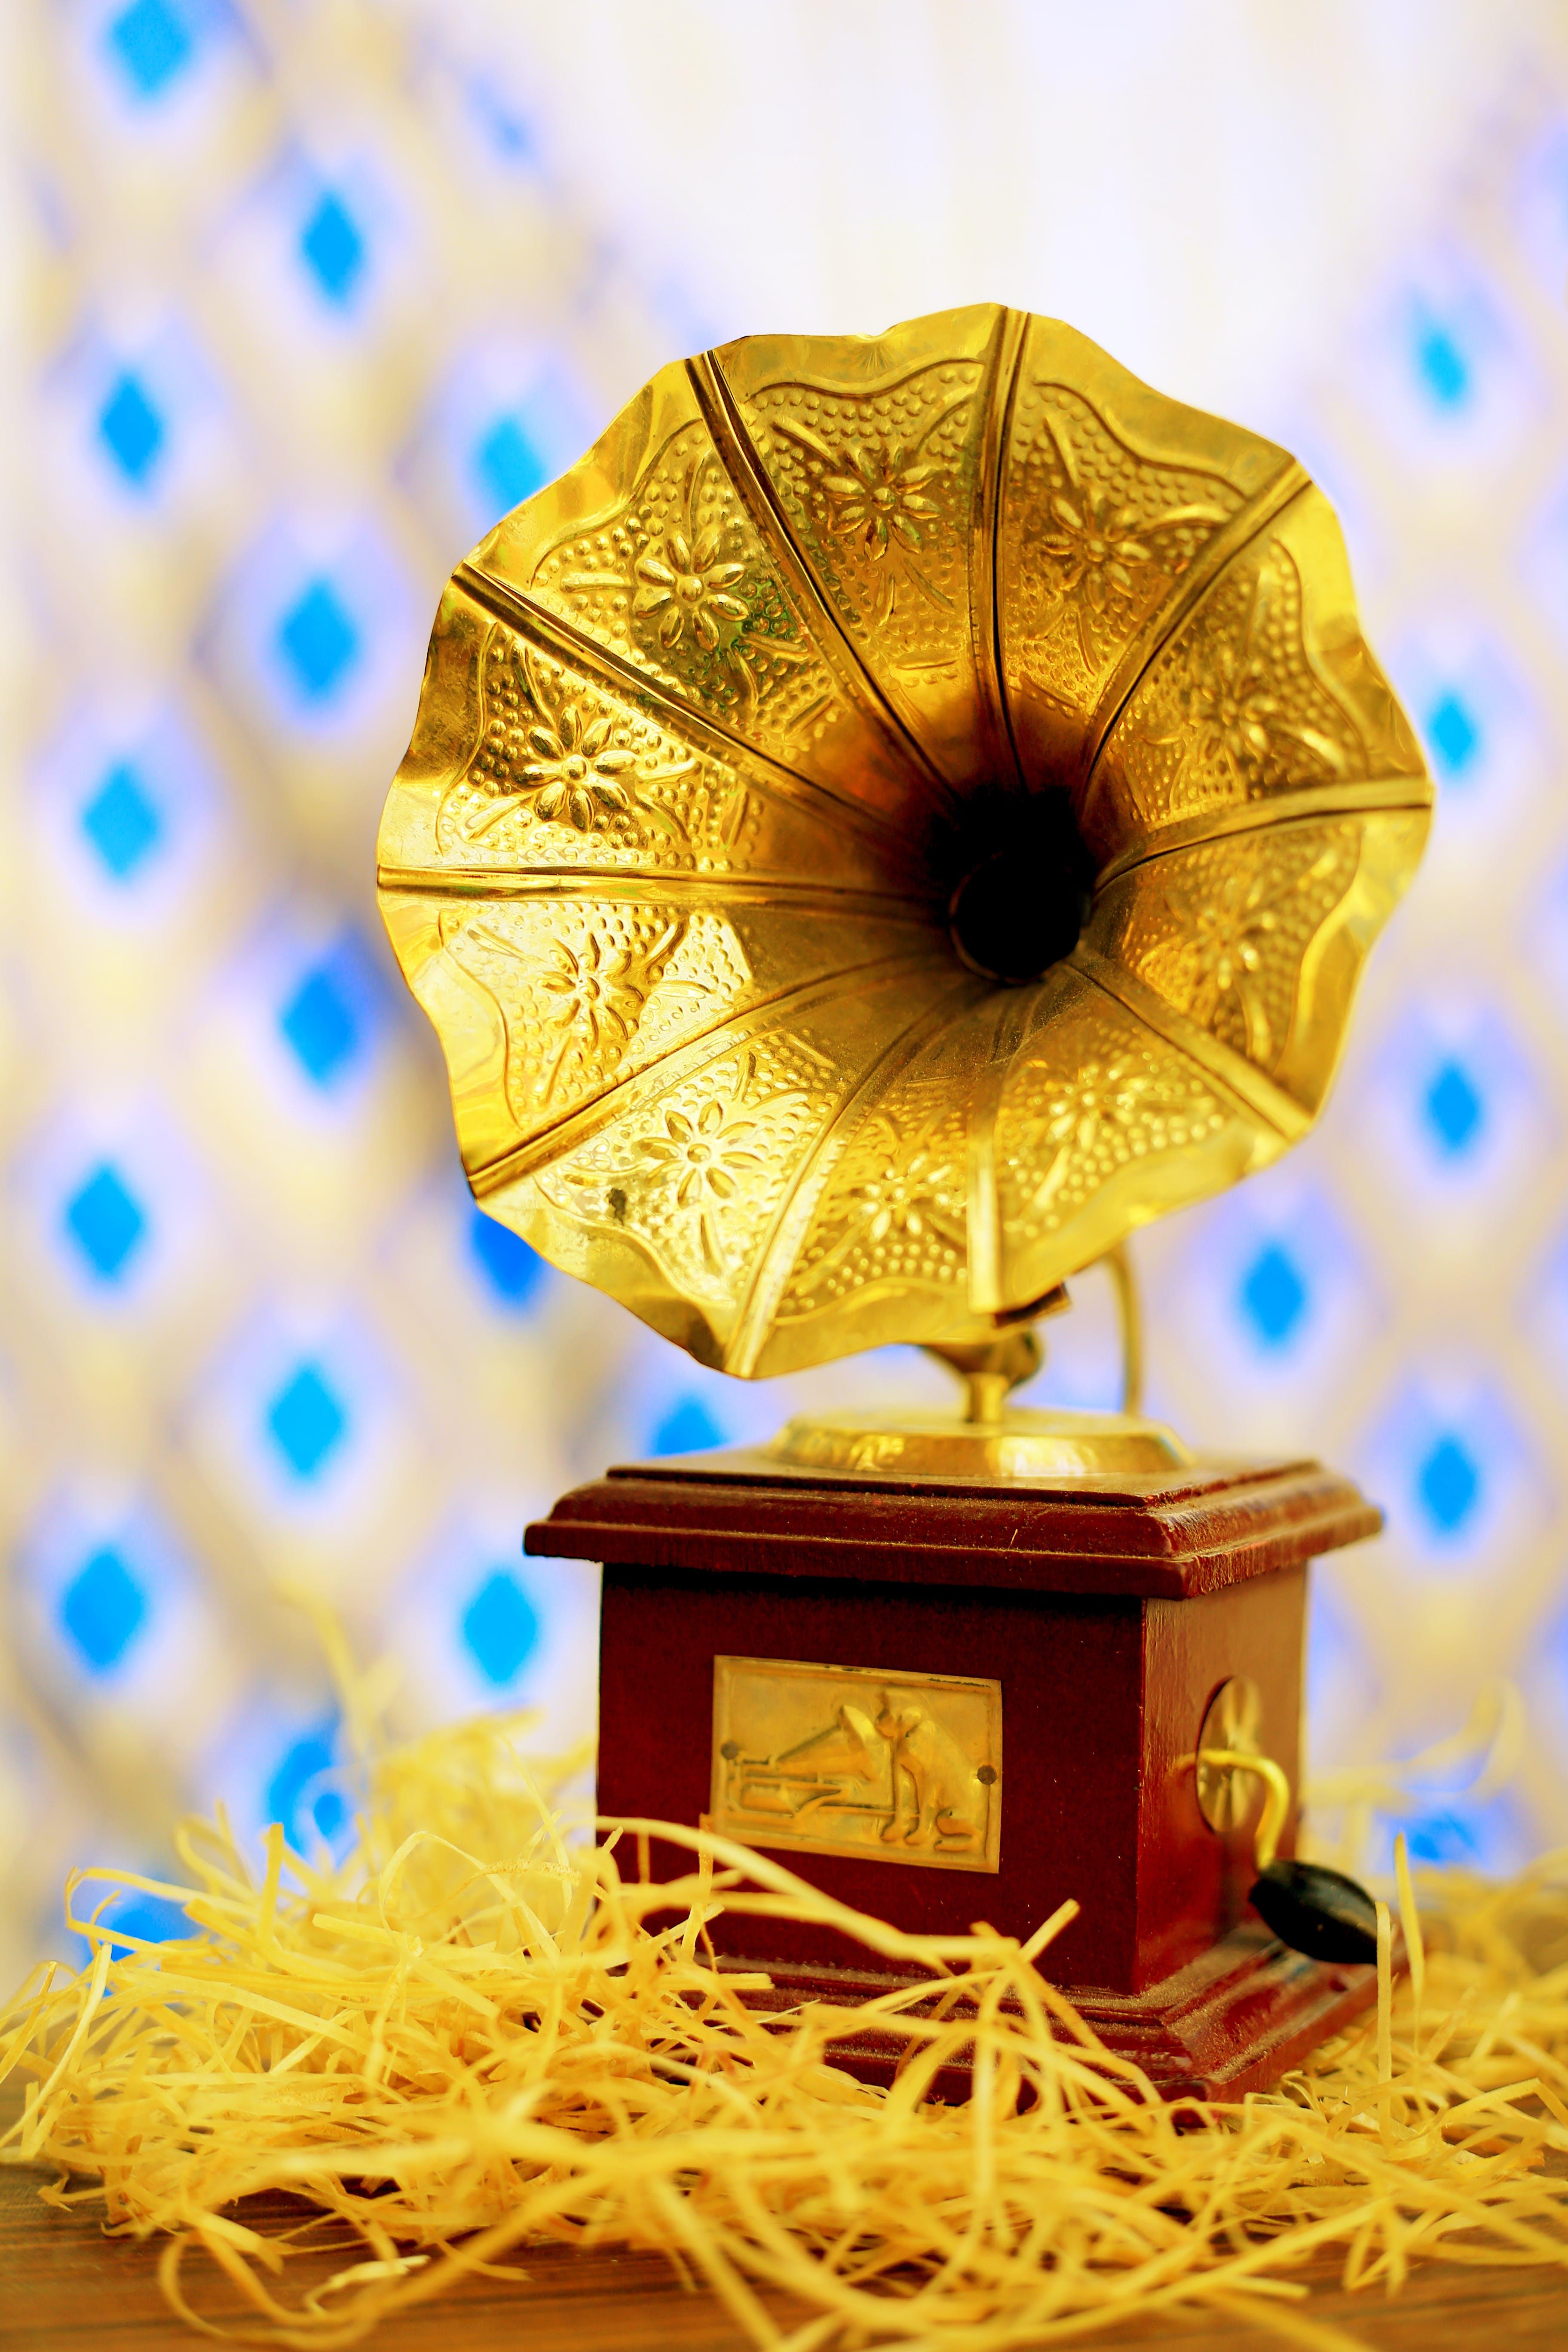 Free stock photo of golden, gramophone, music instrument, retro